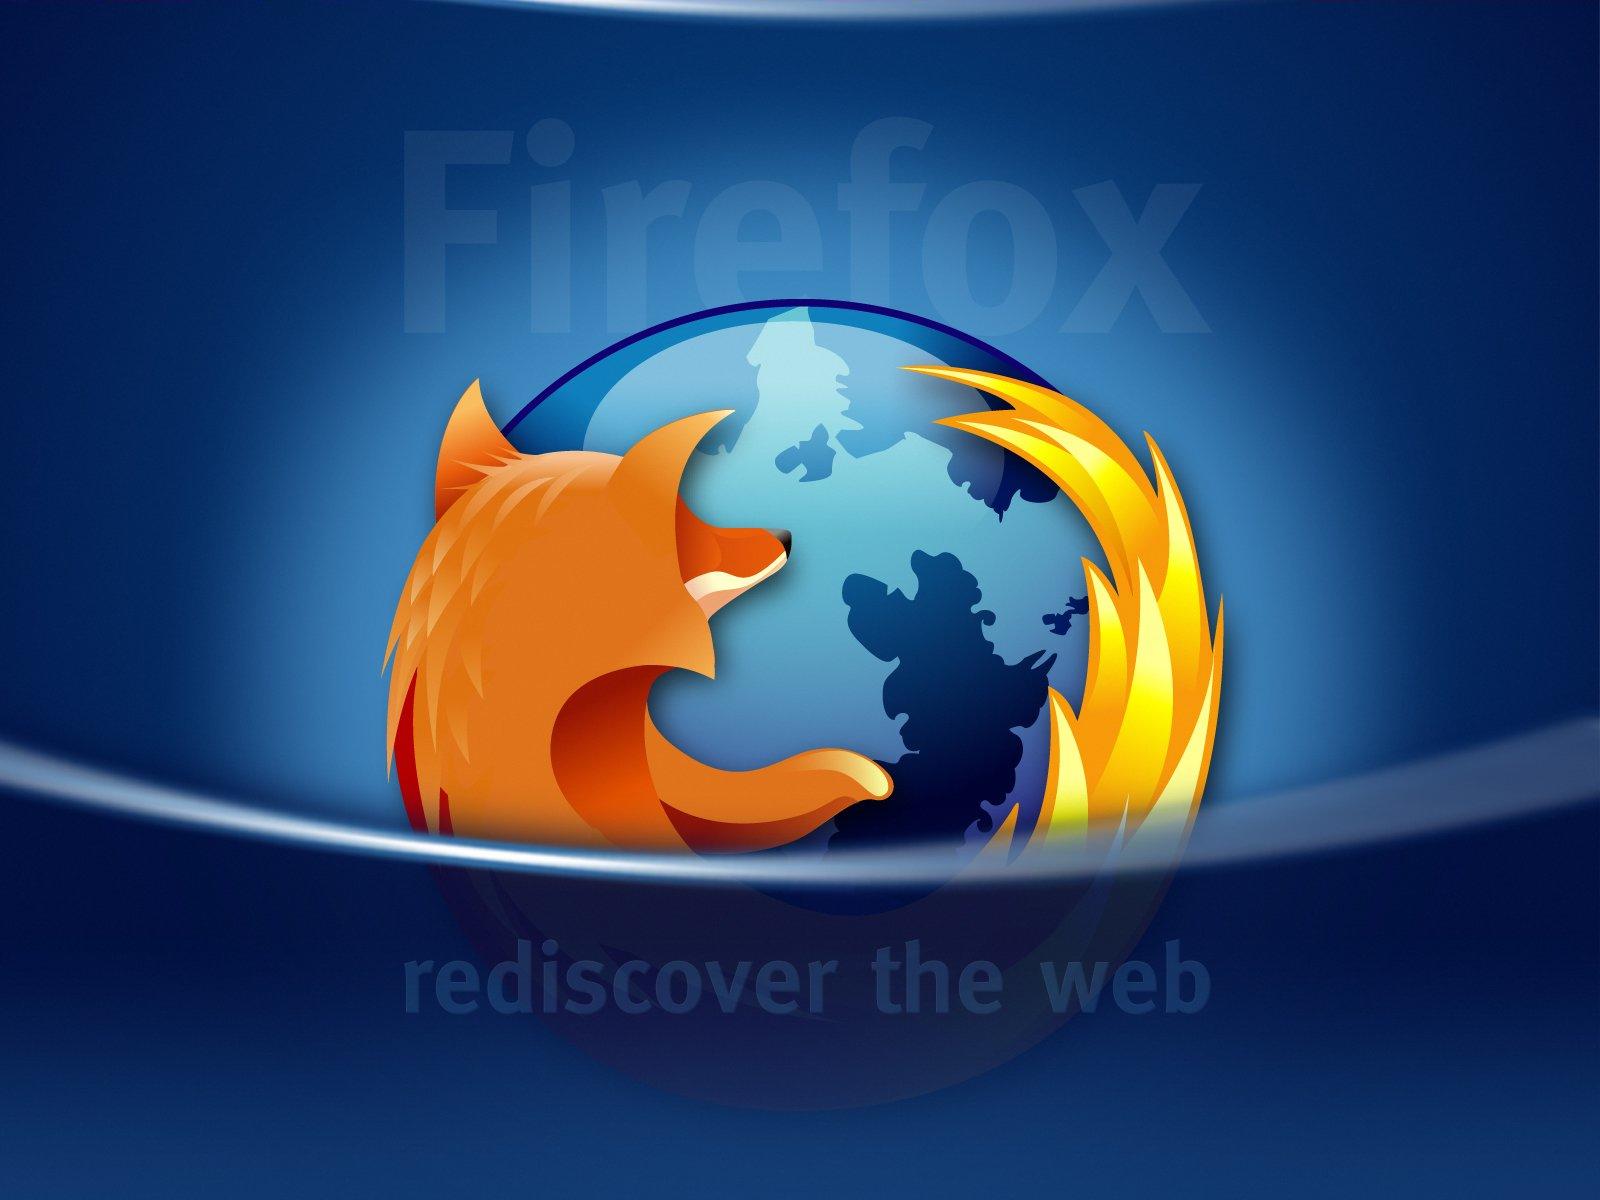 mozilla-firefox-large-logo-wallpaper